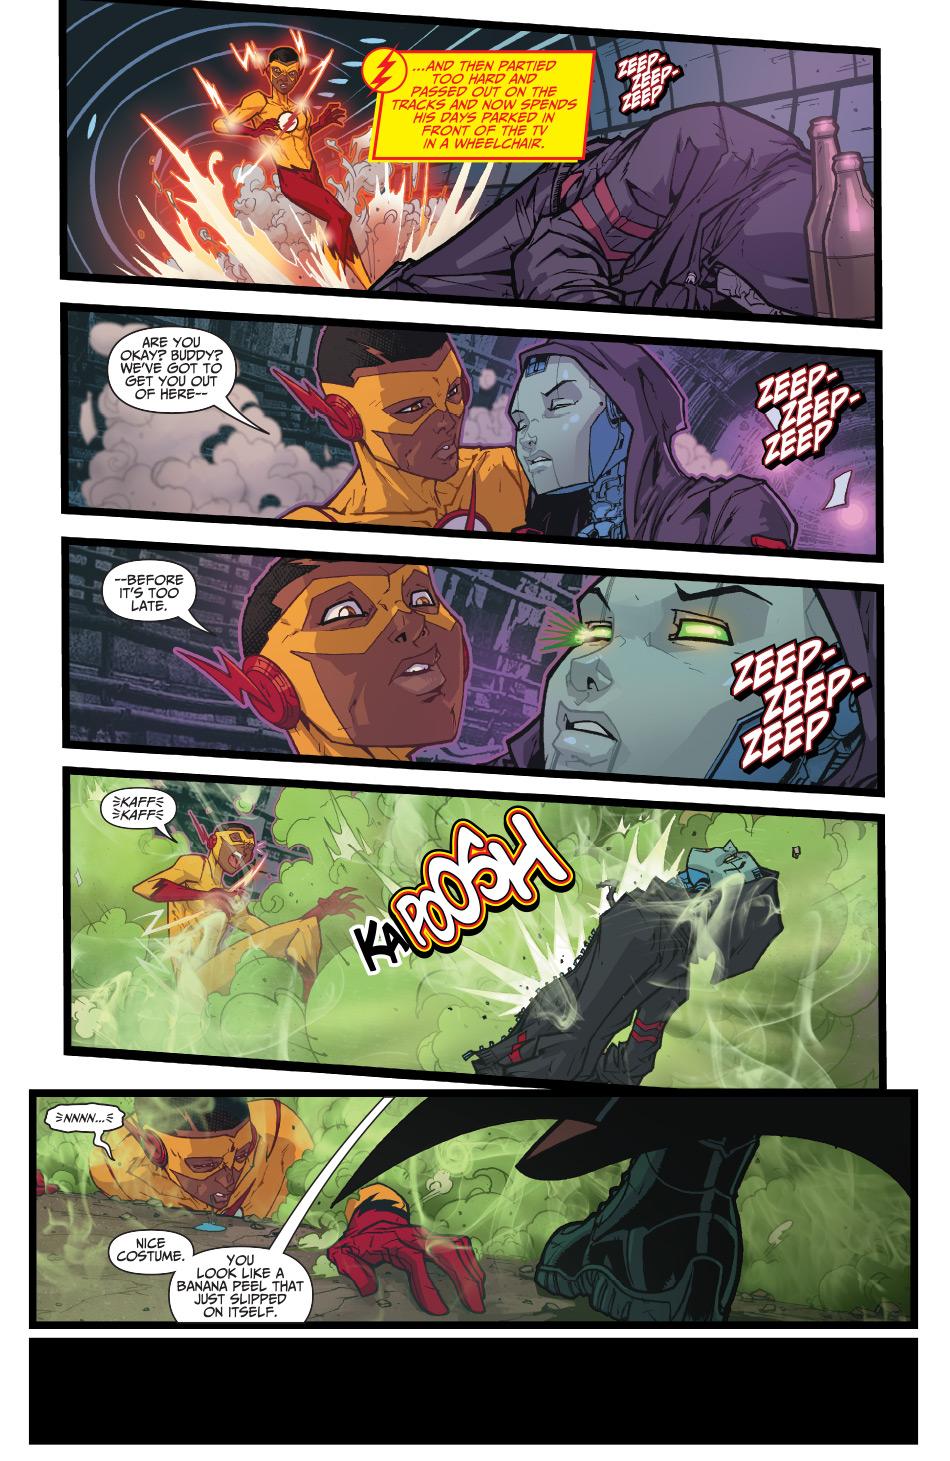 Weird Science Dc Comics First Look Teen Titans Rebirth 1-3608